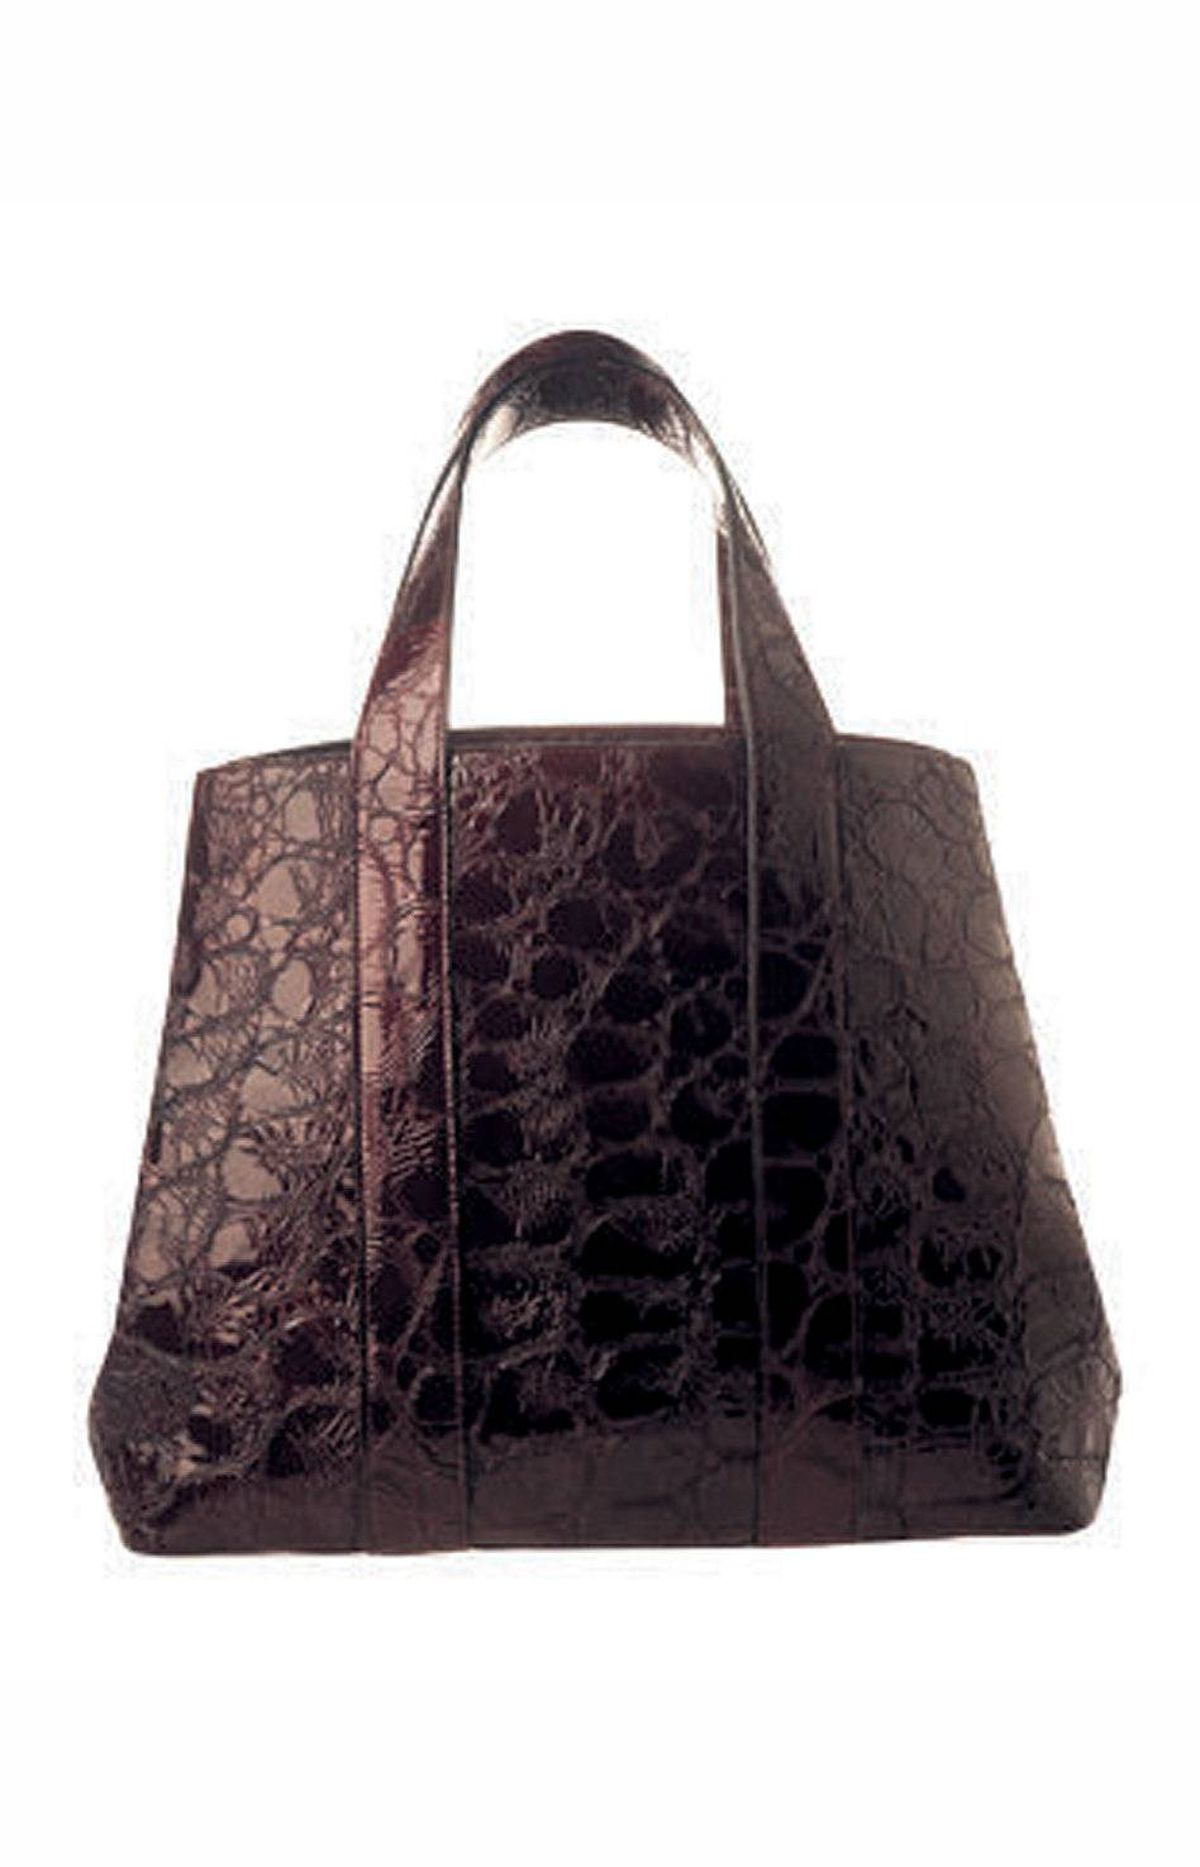 Prune-coloured Alaia alligator purse, $2,730 at The Room (www.thebay.com).